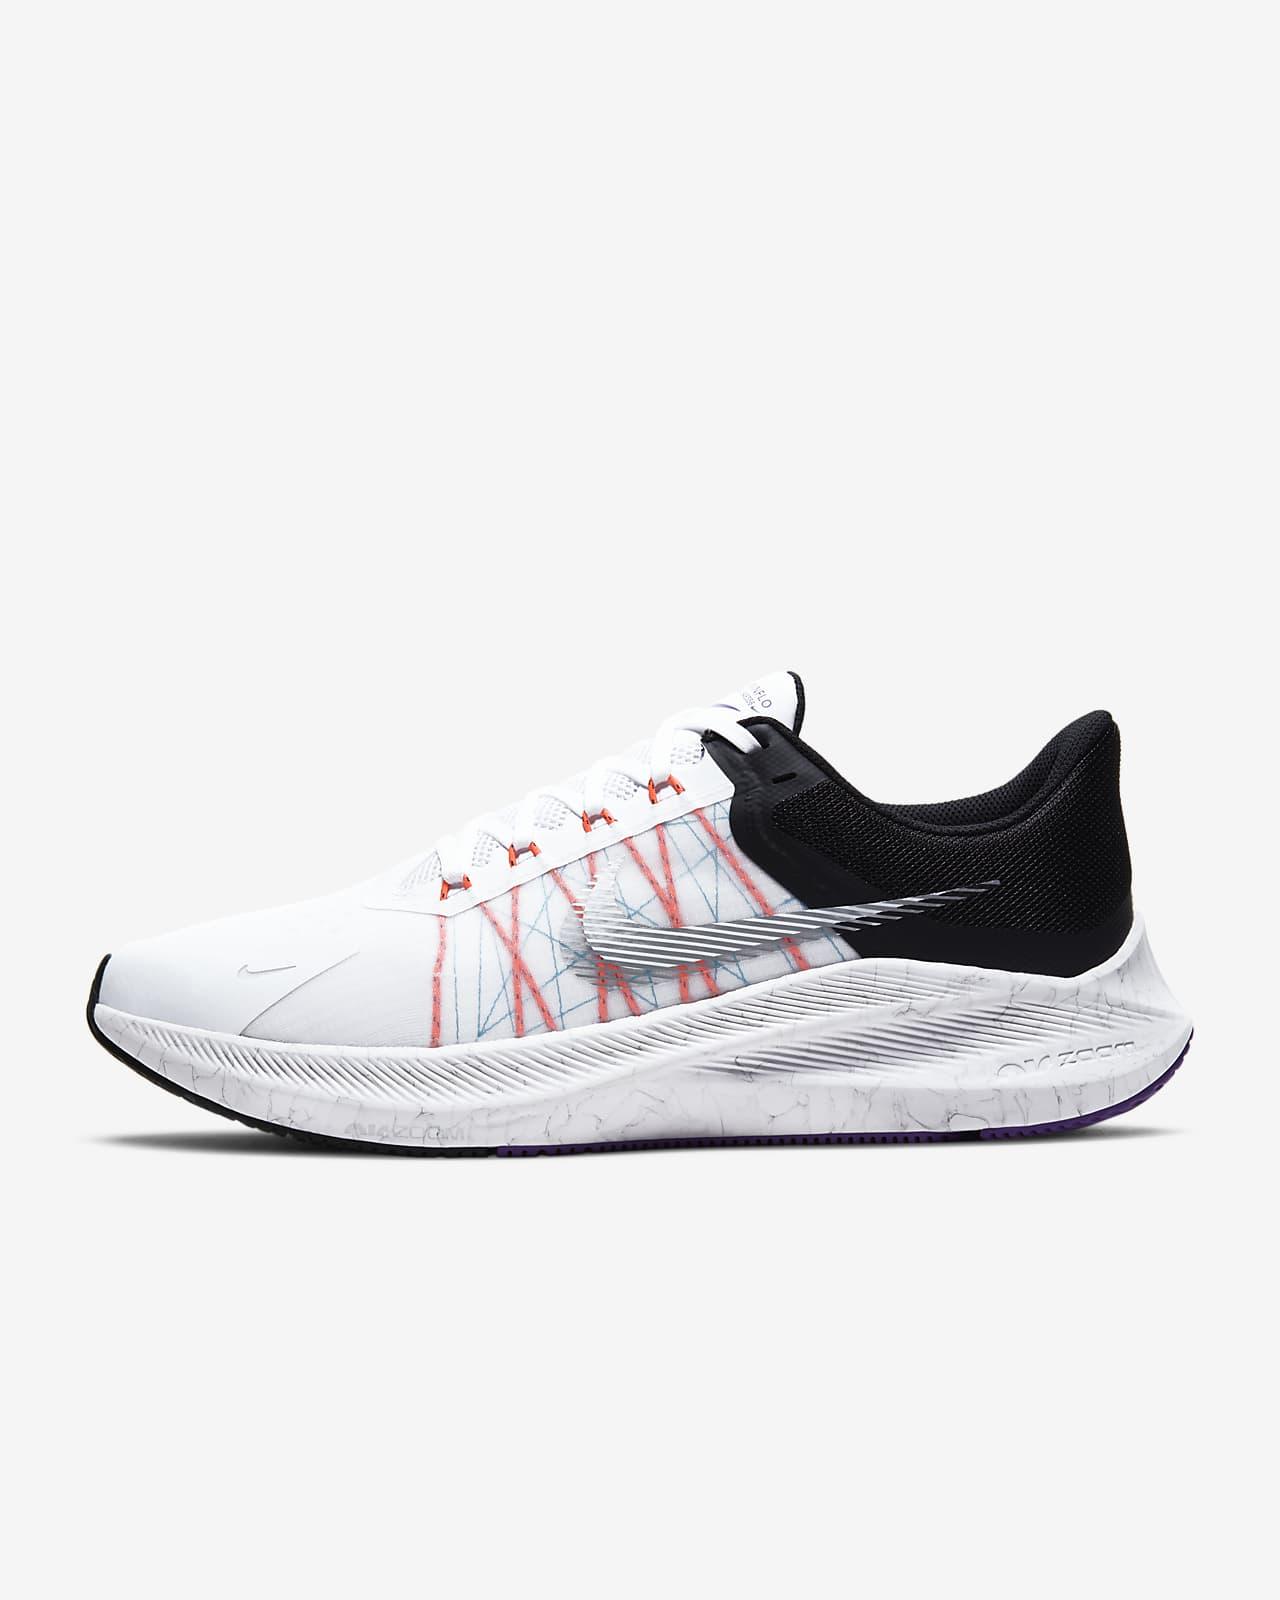 Nike Winflo 8 Men's Running Shoe